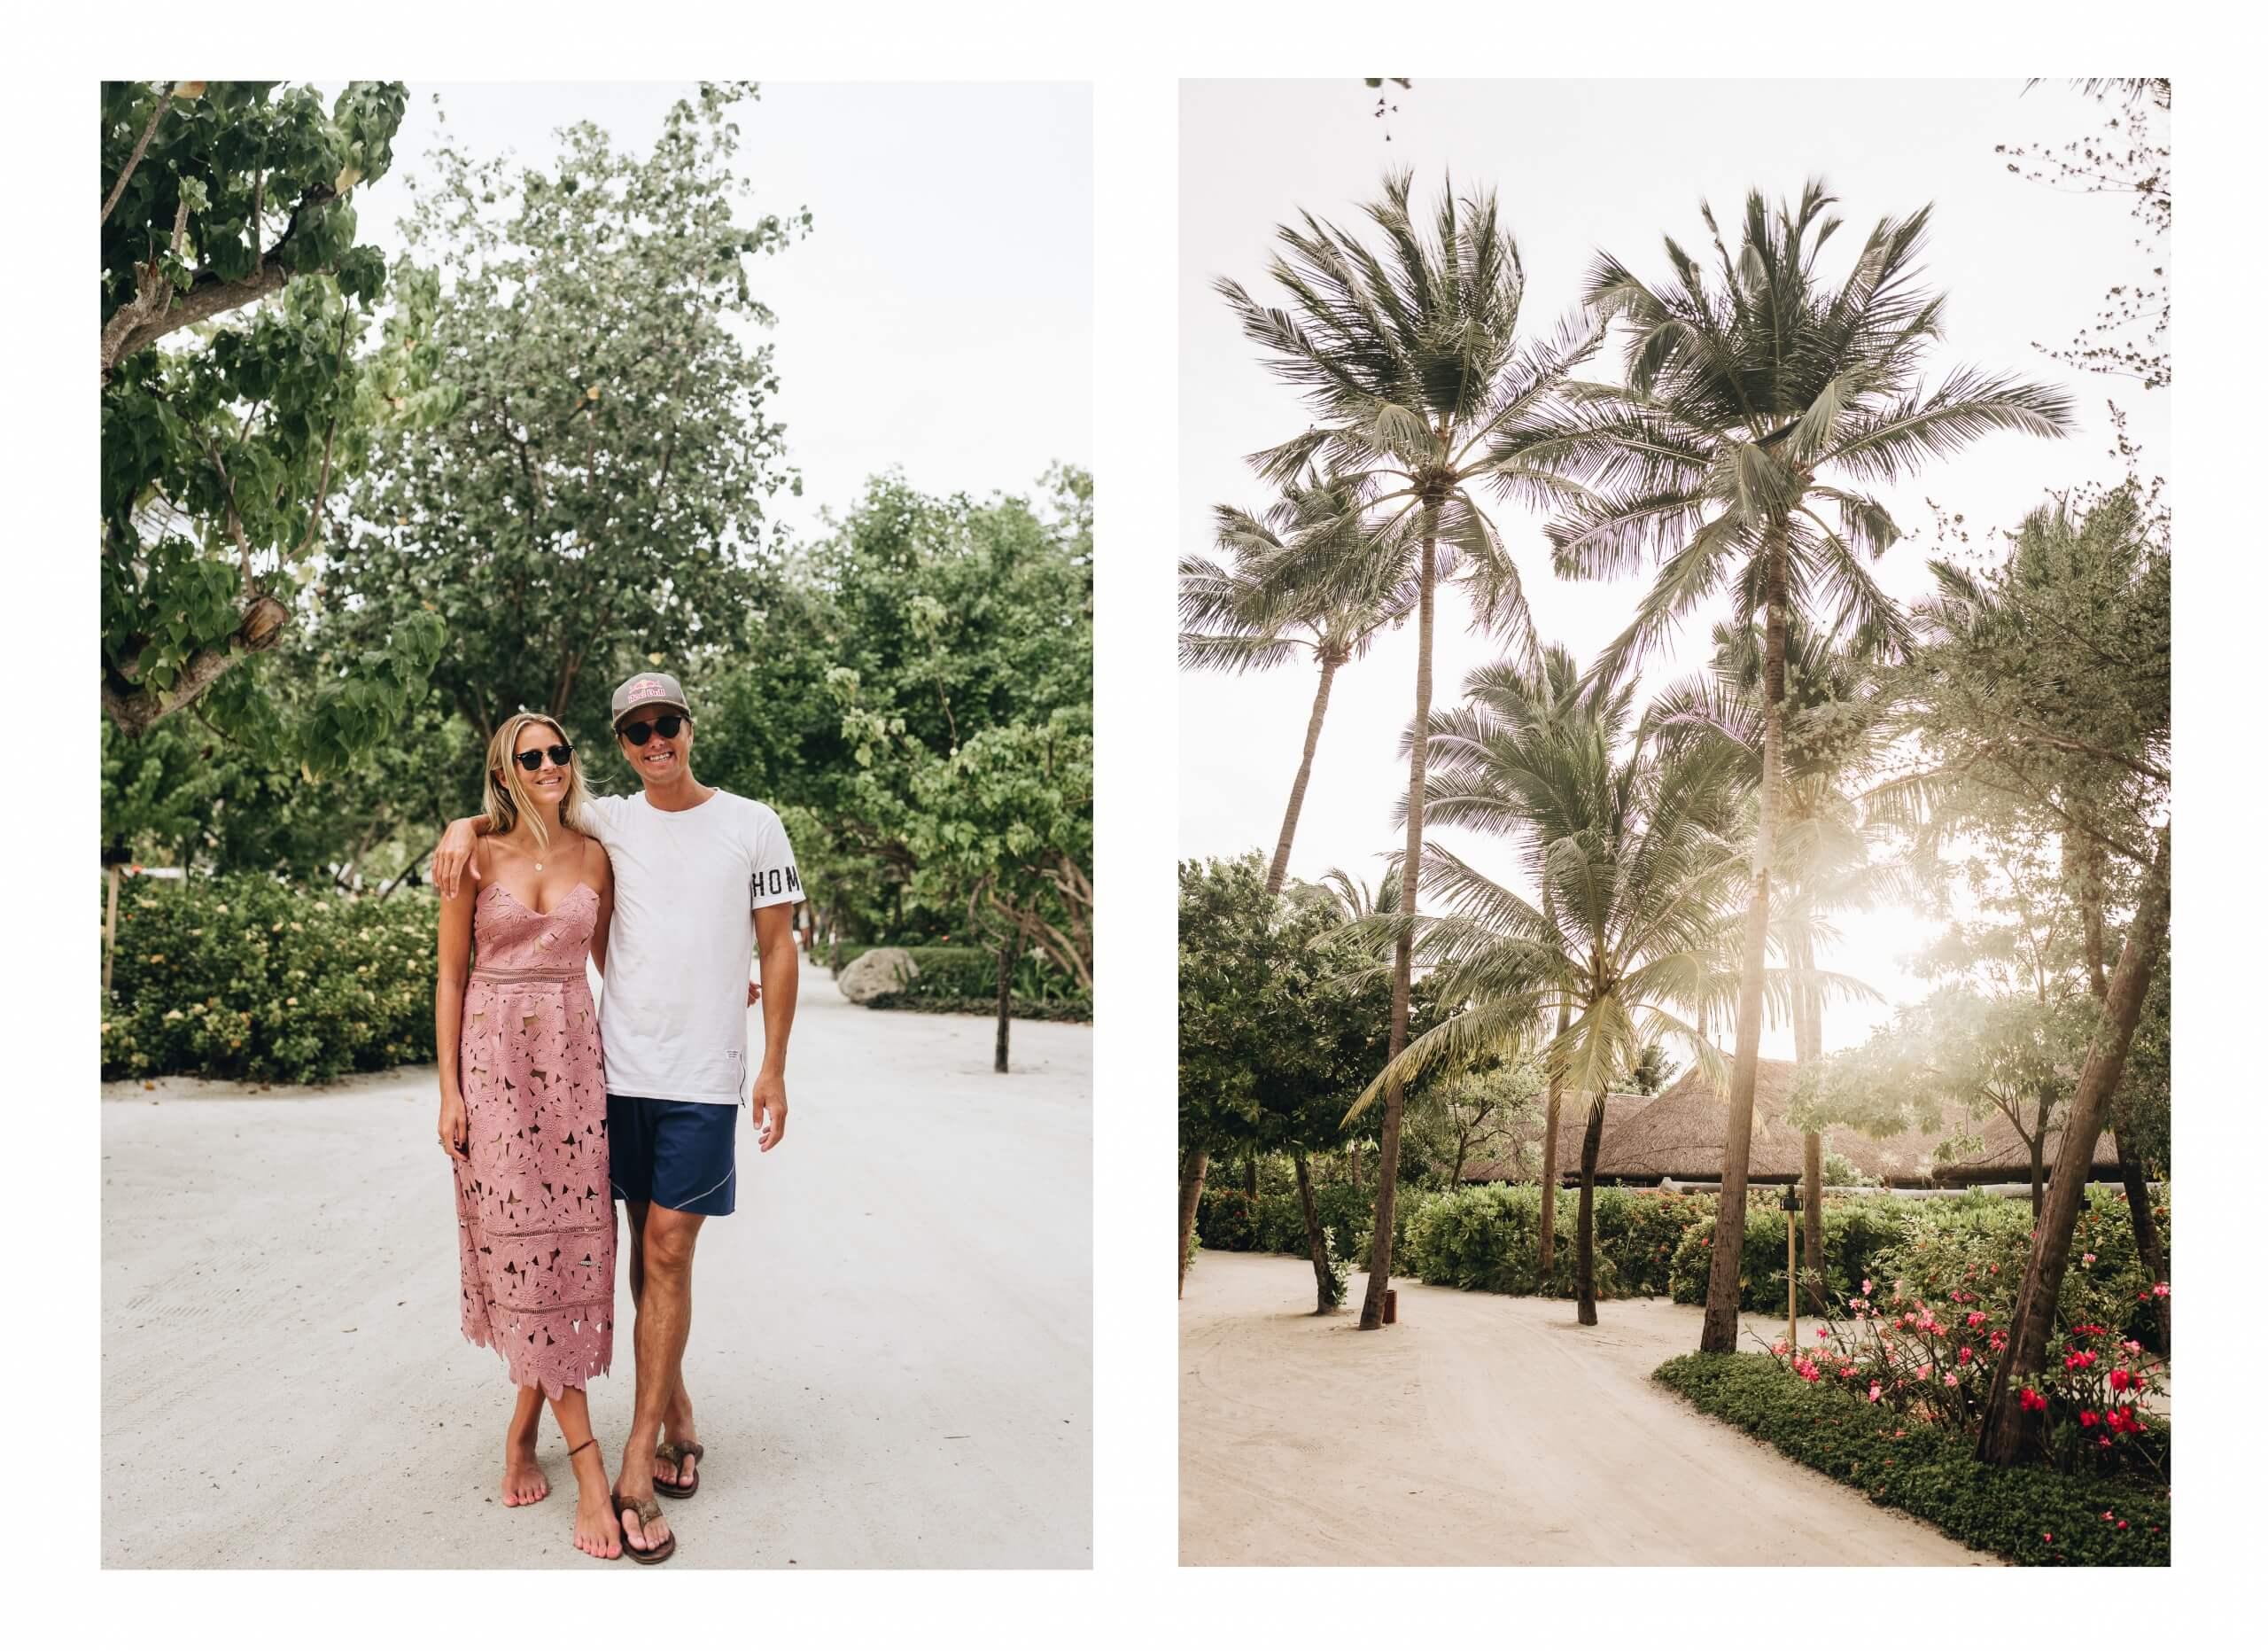 janni-deler-maldives-snapshotsl1140815-copy